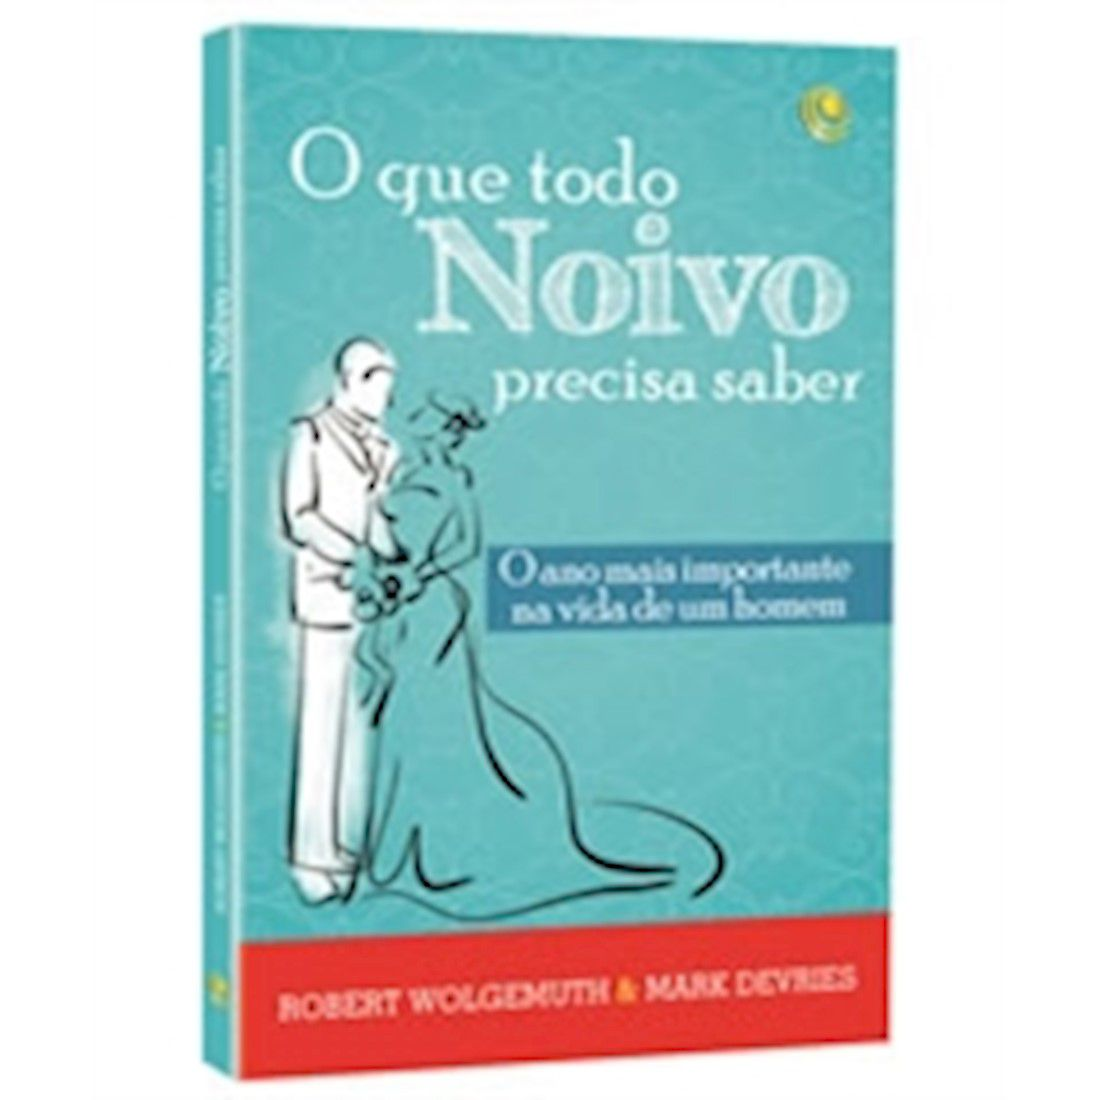 Livro O Que Todo Noivo Precisa Saber